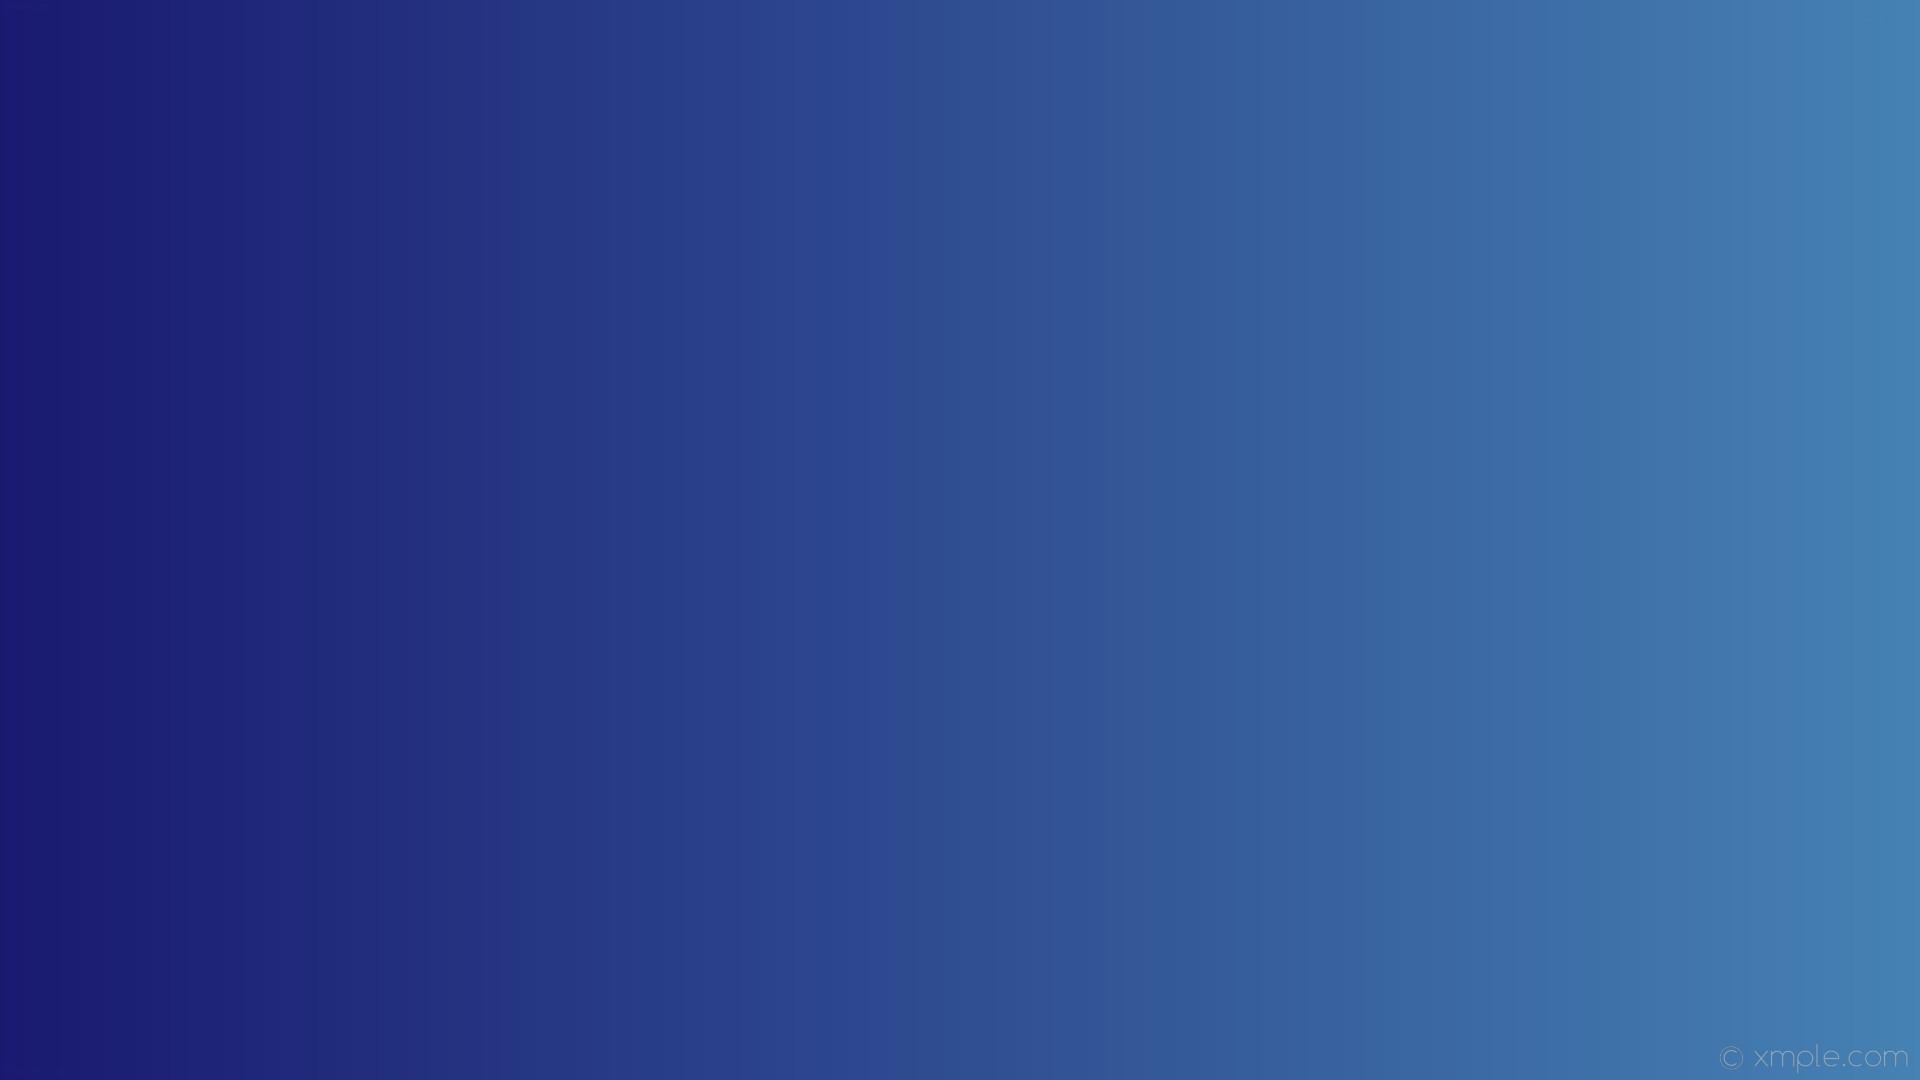 wallpaper linear gradient blue steel blue midnight blue #4682b4 #191970 0°